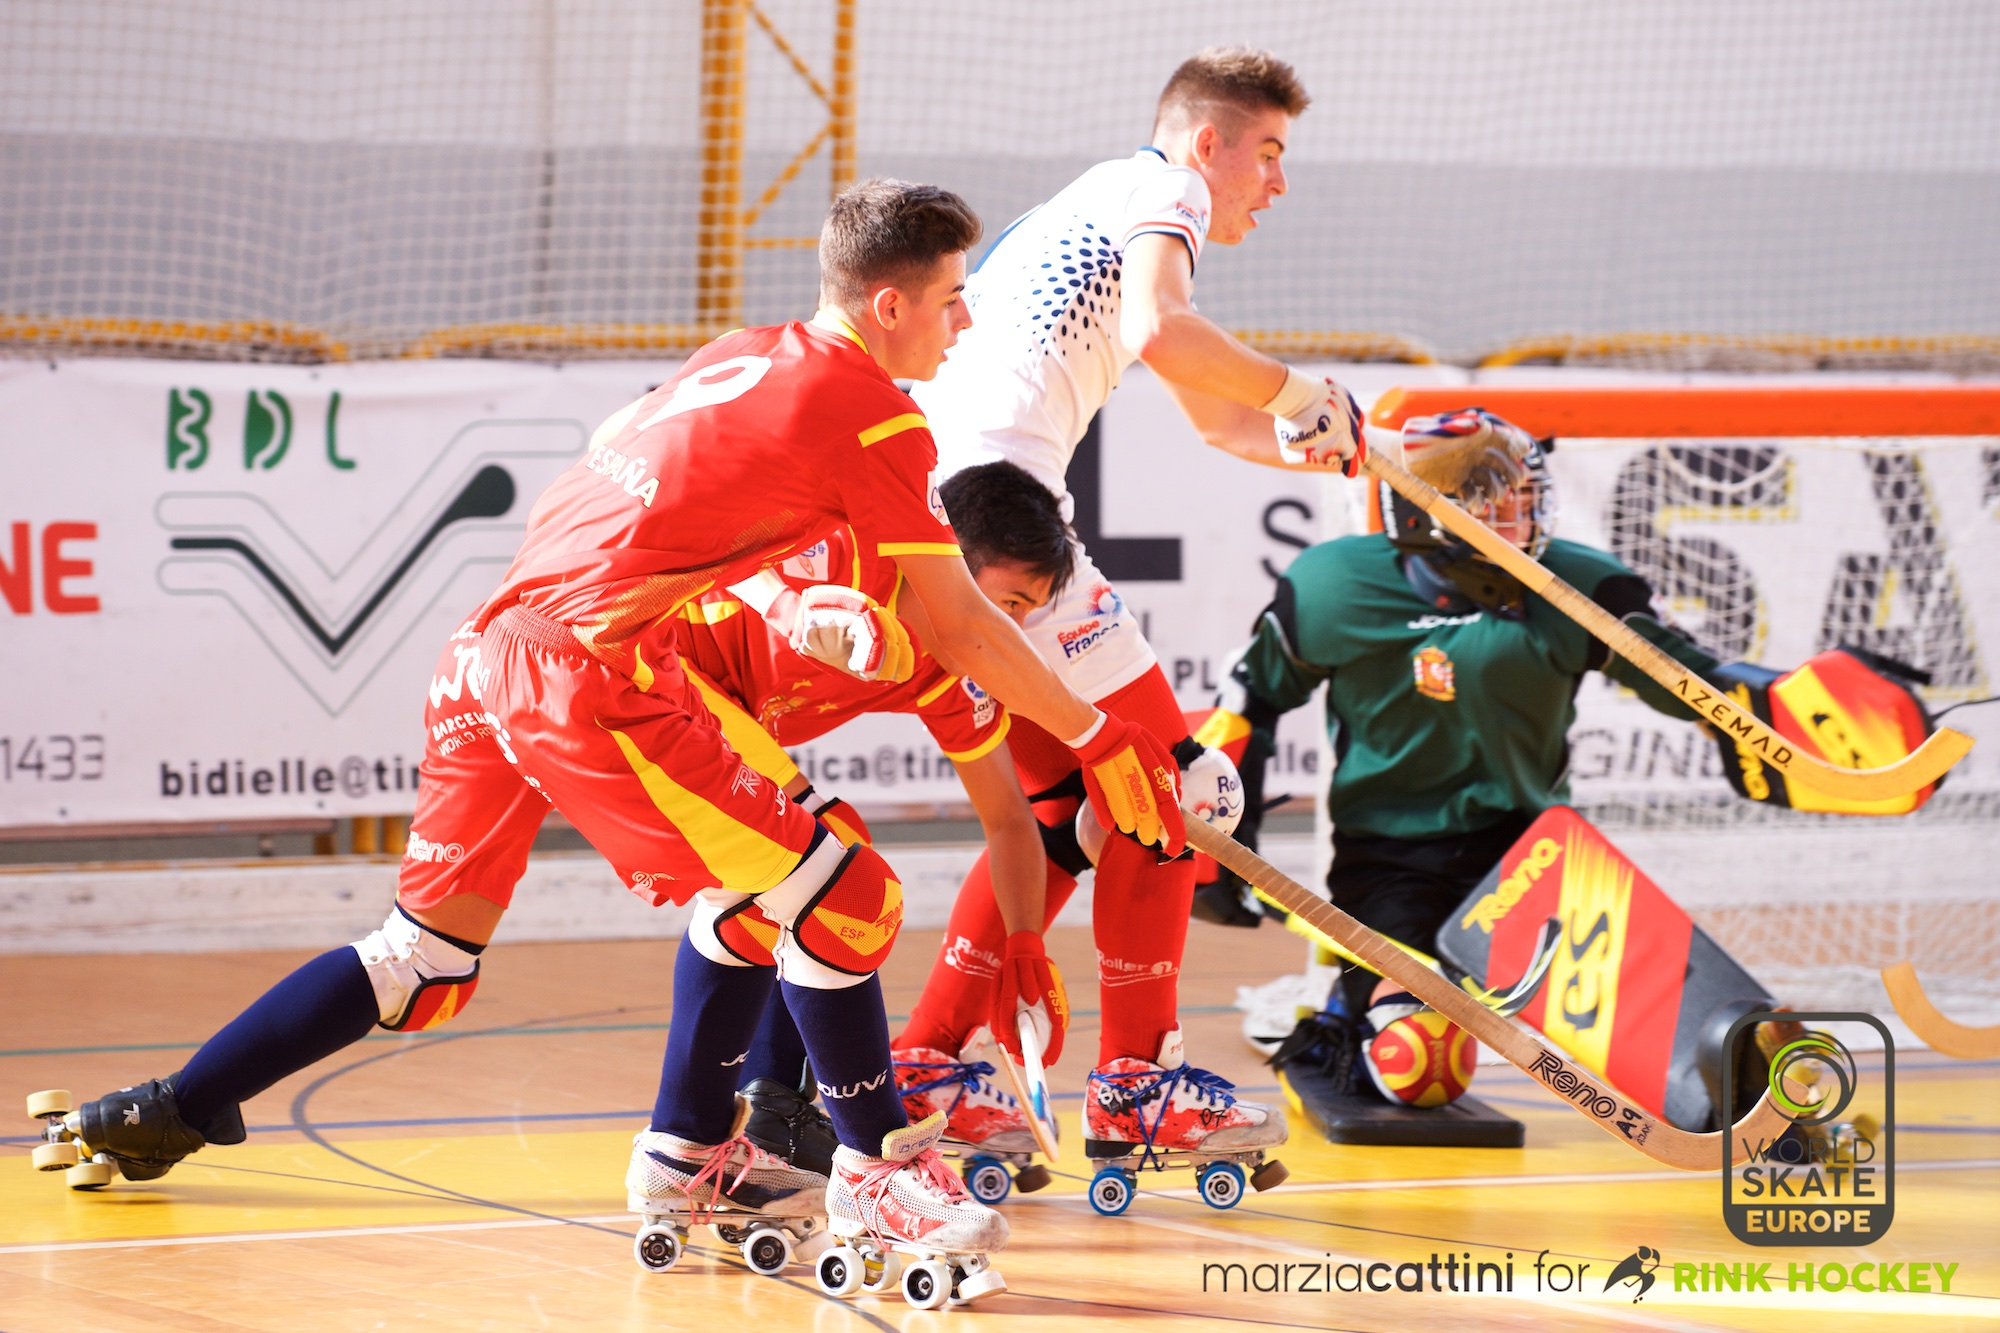 18-09-06-Spain-France11